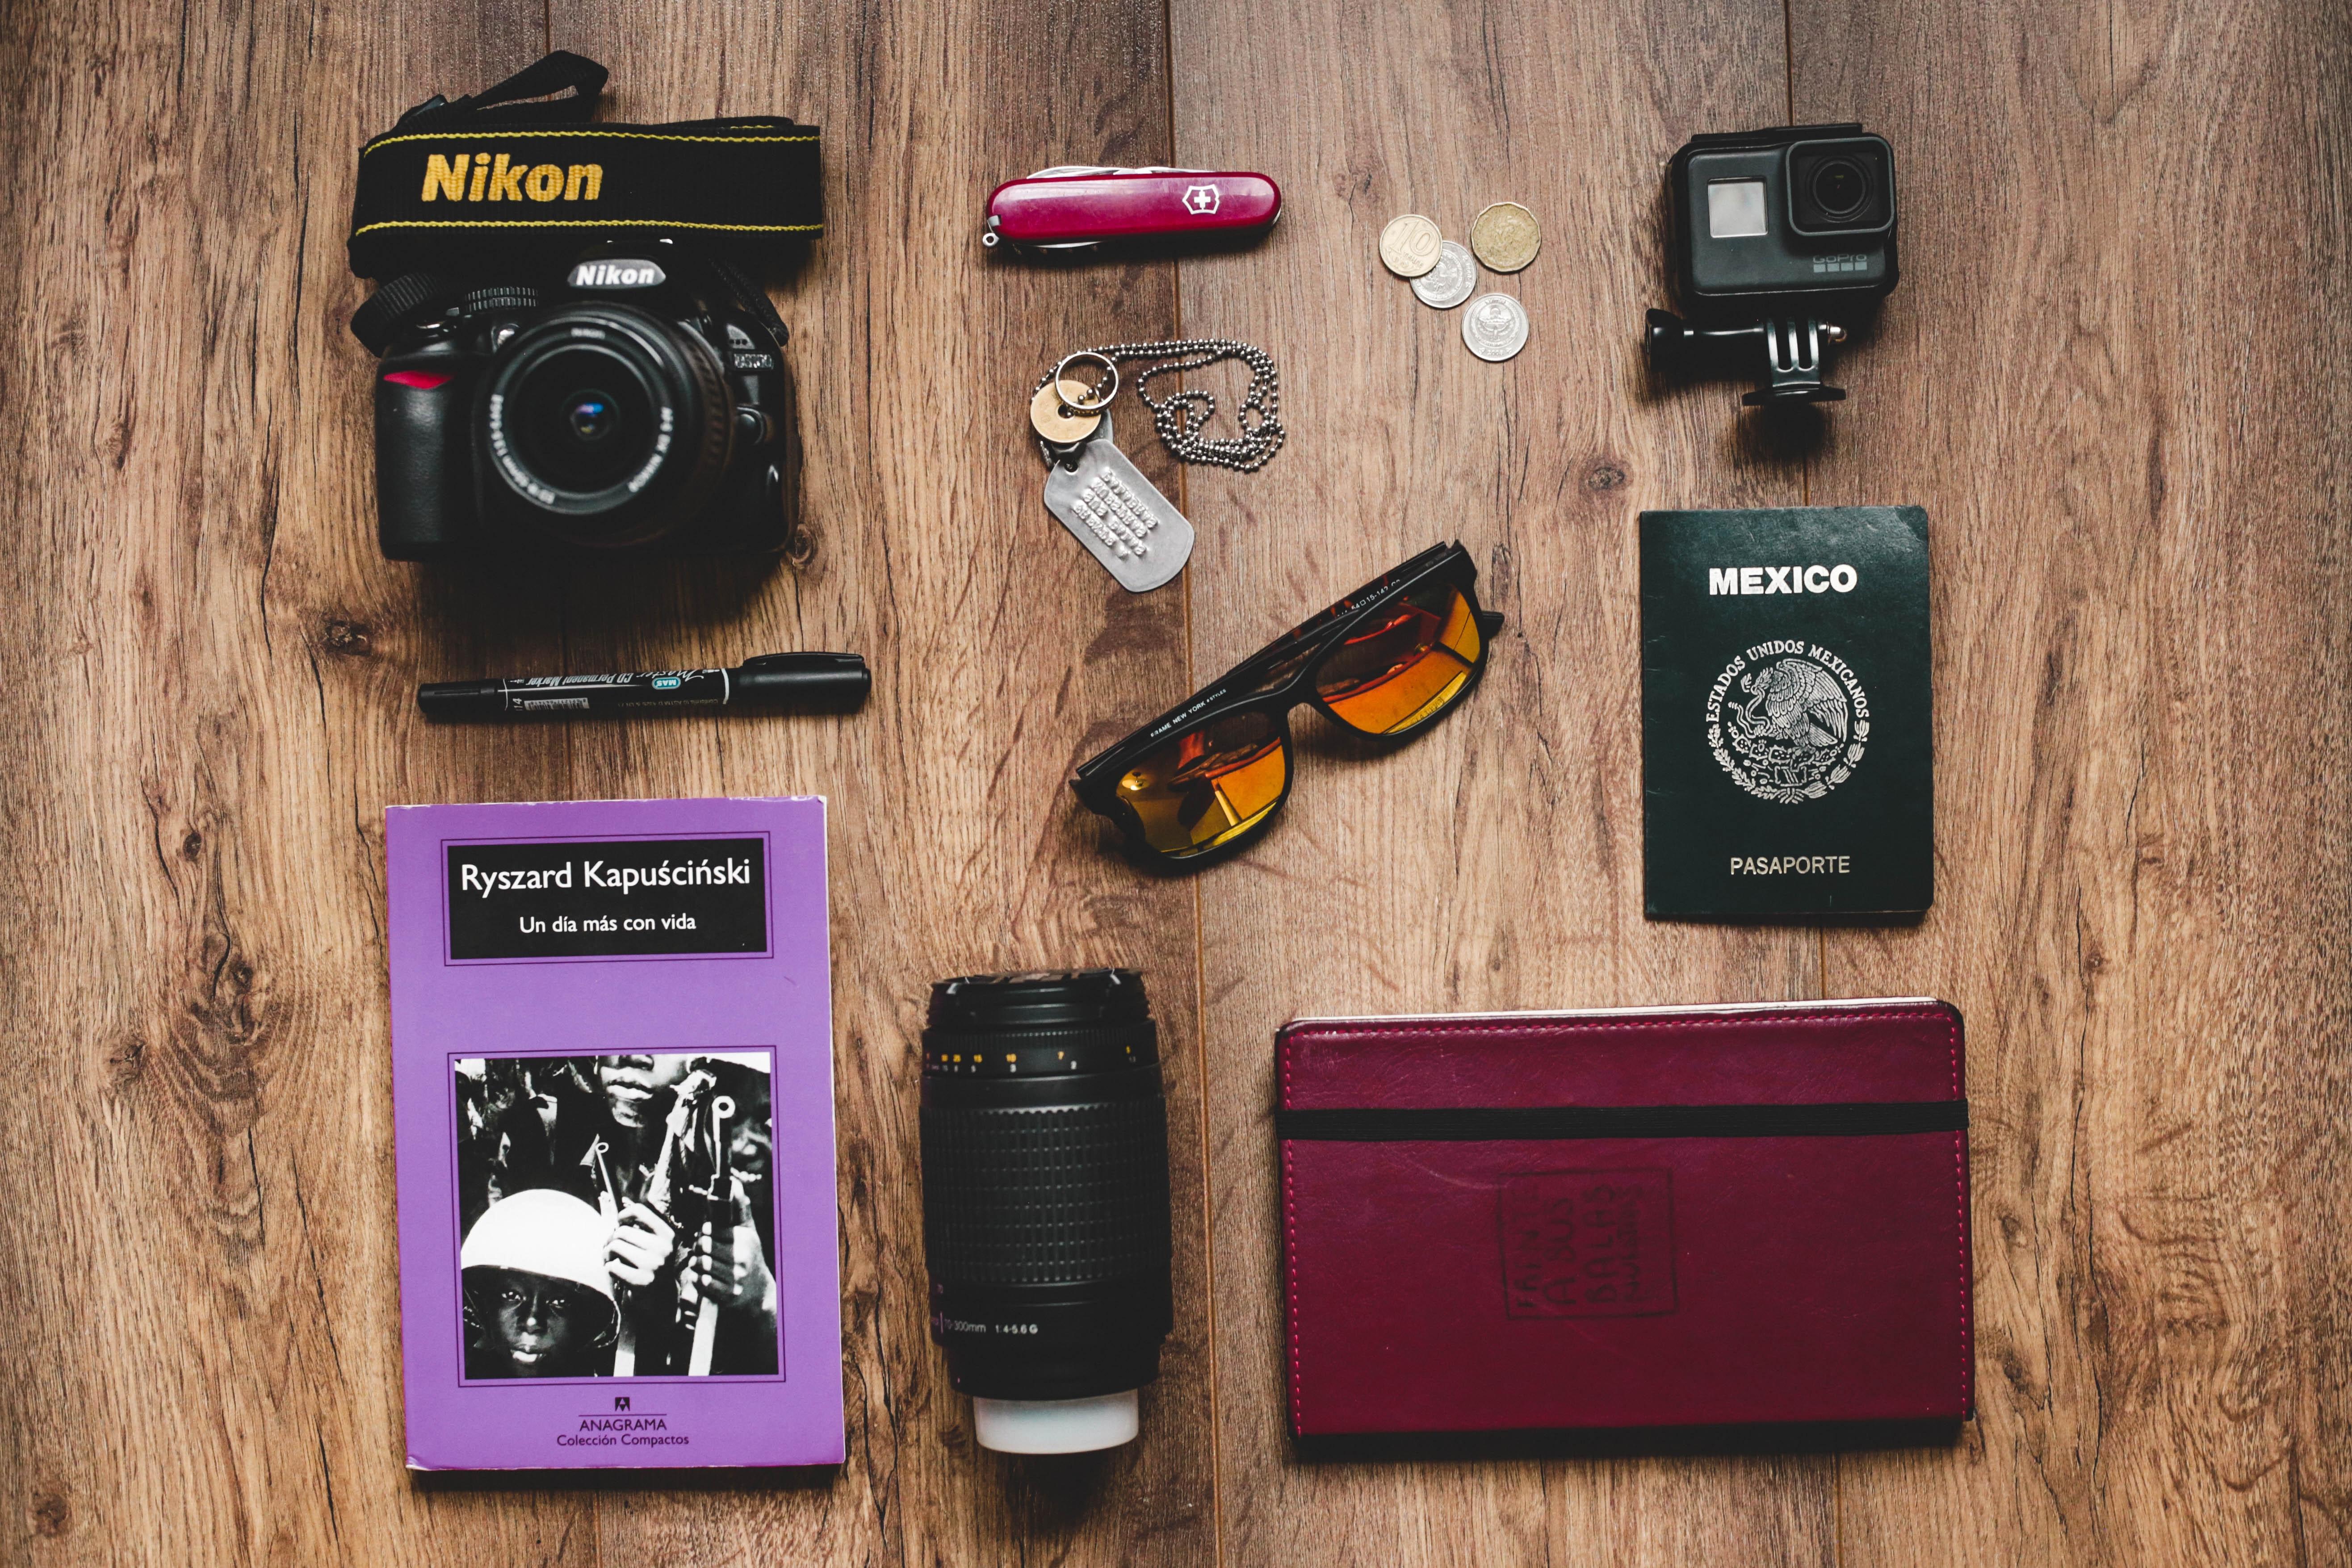 Black Nikon Dslr Camera, Gopro Hero Session, and Black Framed Sunglasses, Book, Paper, Technology, Table, HQ Photo